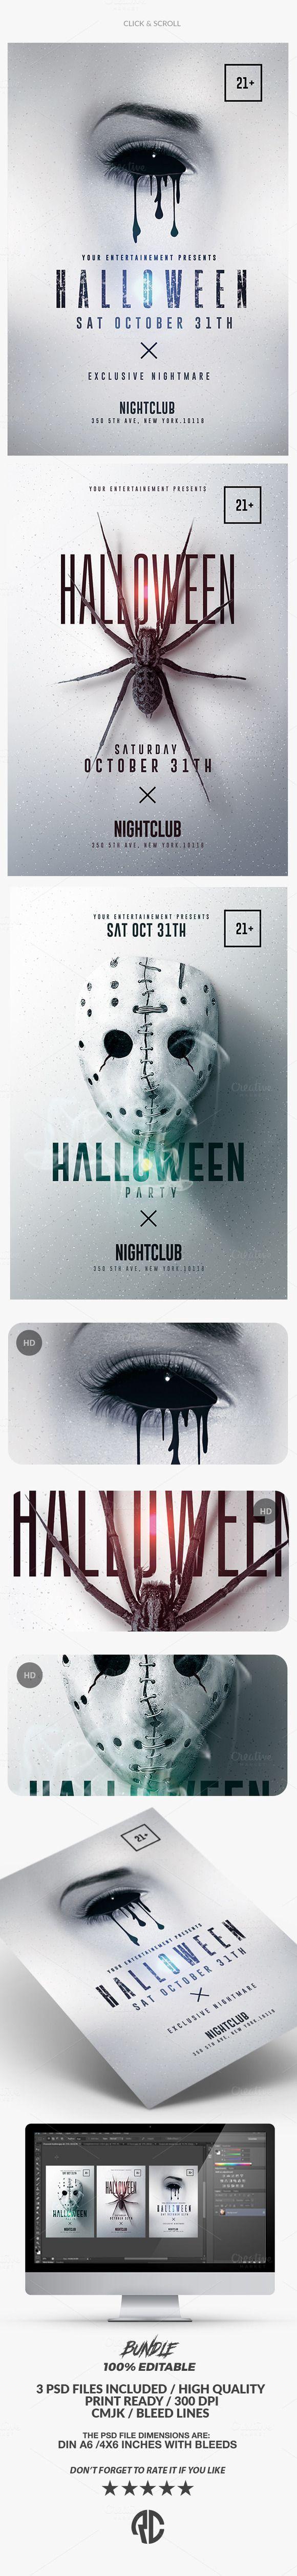 Best 25+ Halloween havoc ideas on Pinterest | DIY Halloween fog ...